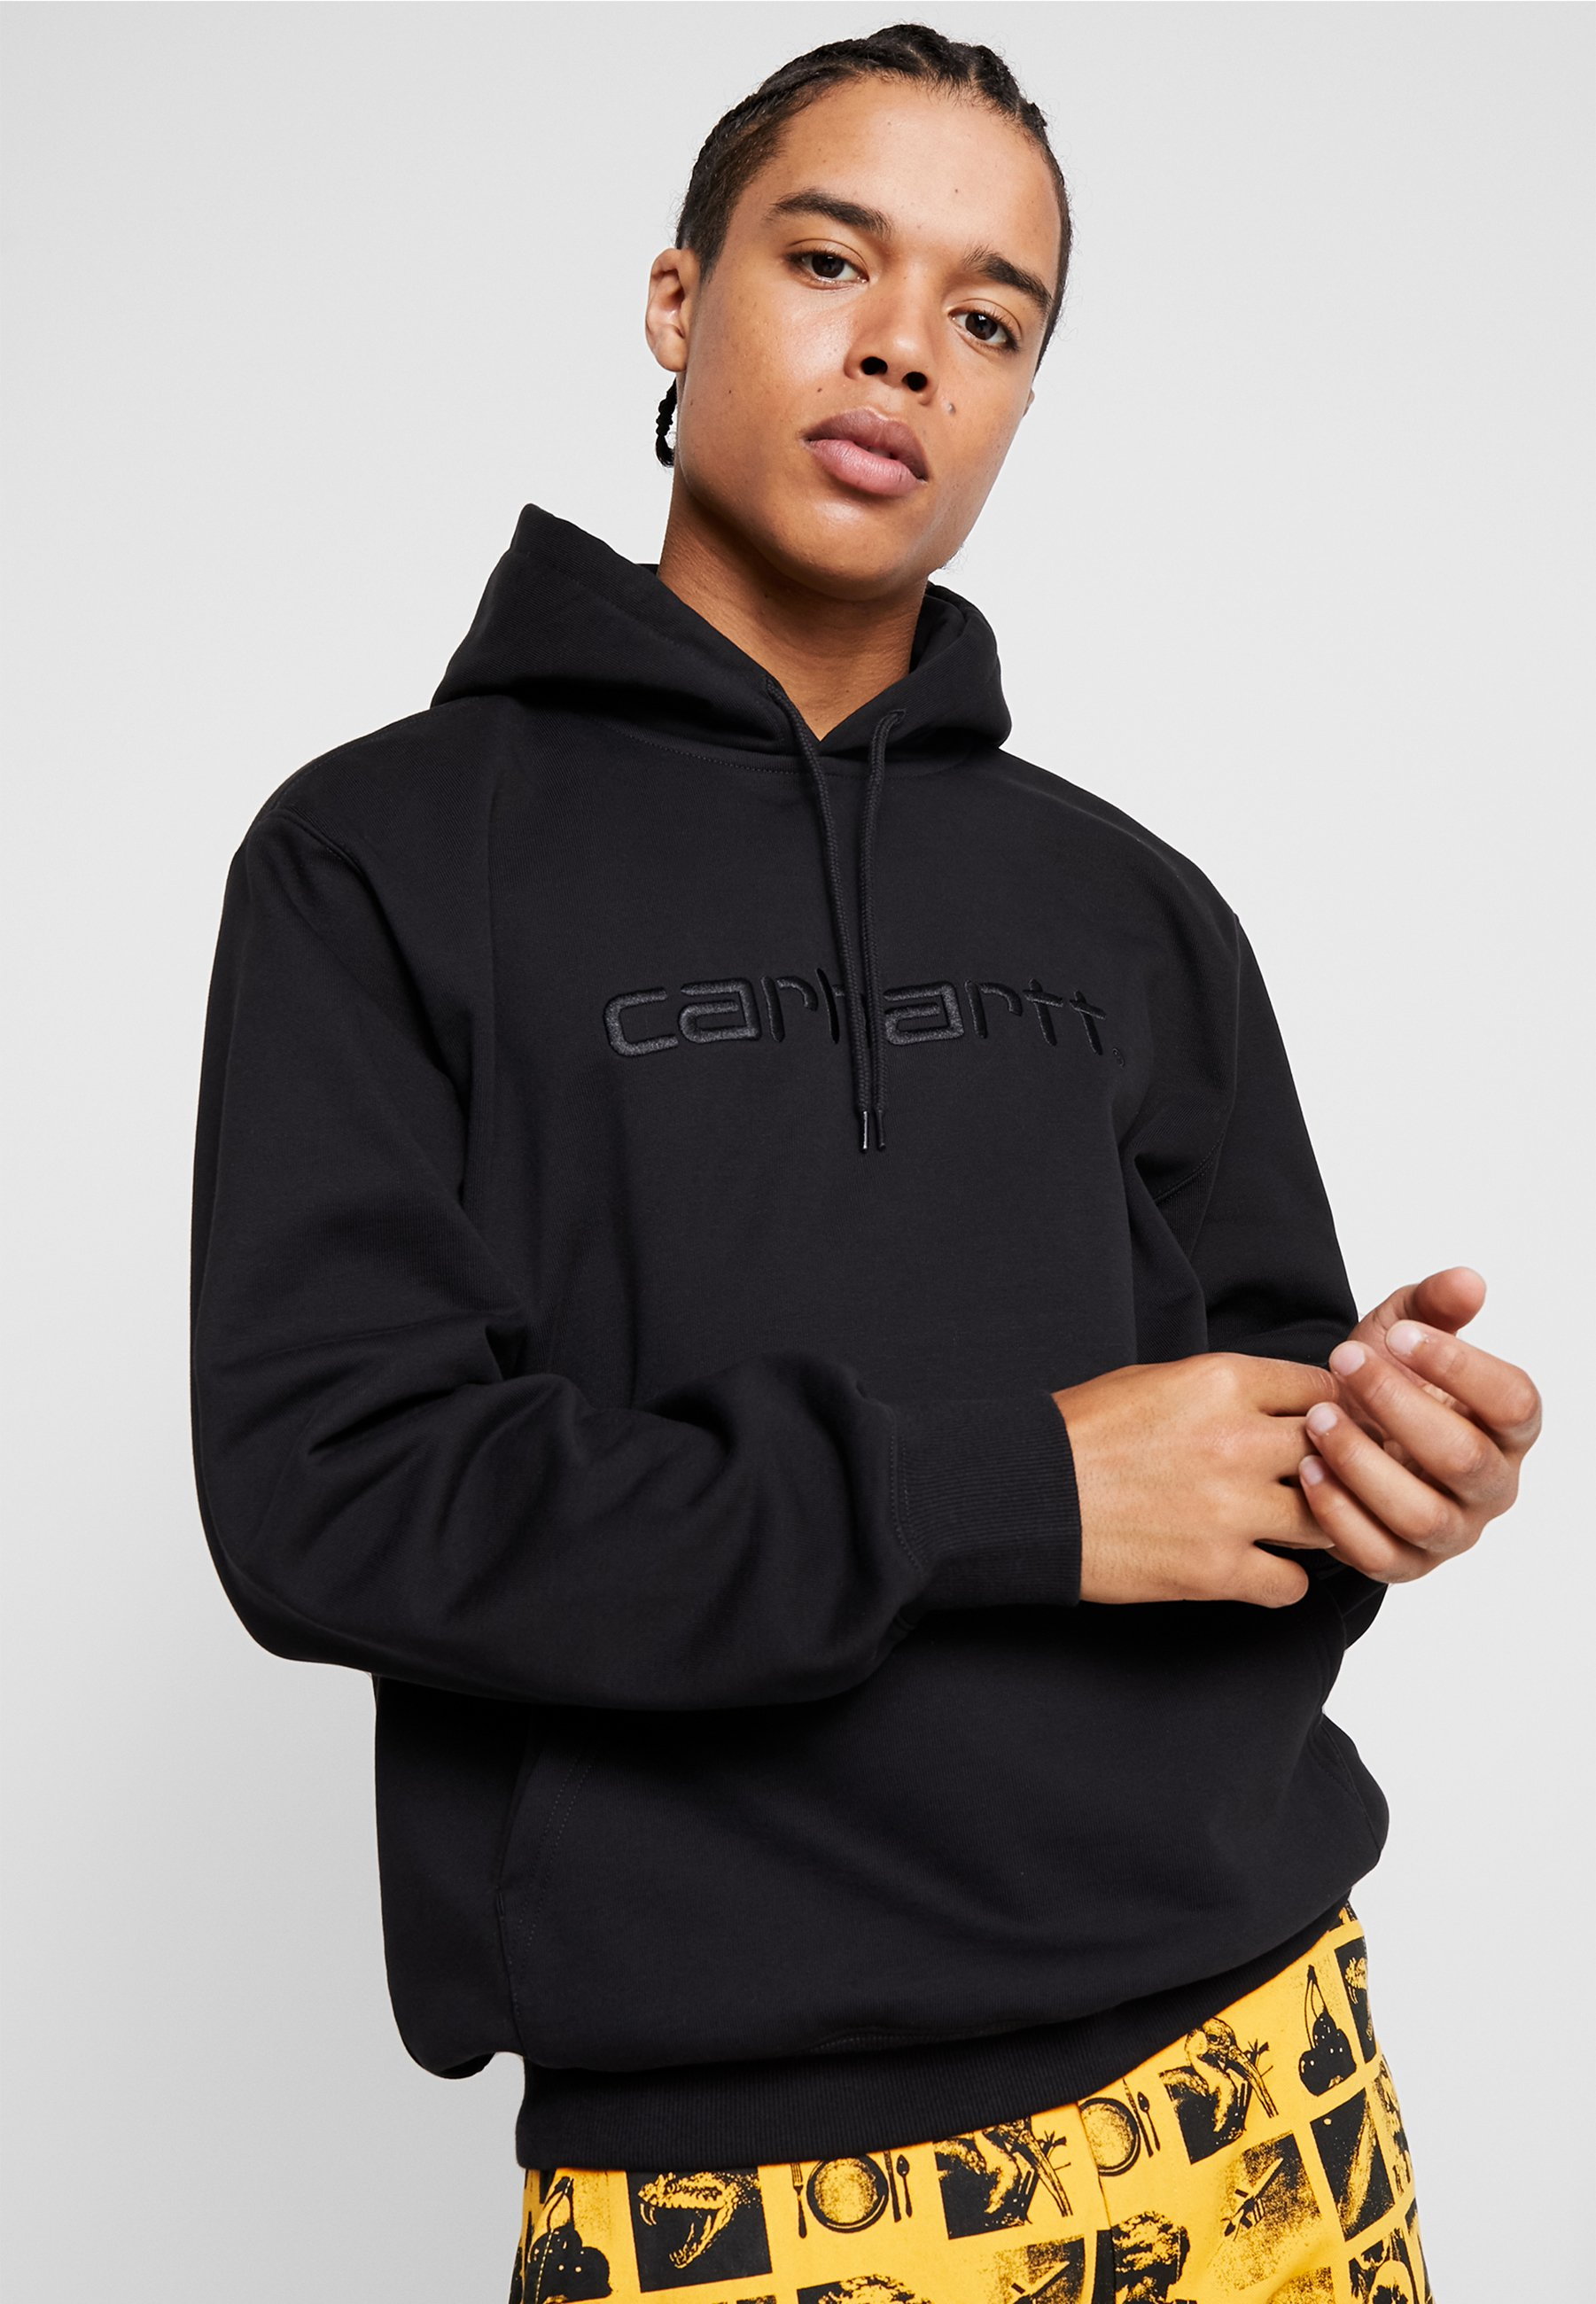 Best Supplier Cheap And Nice Men's Clothing Carhartt WIP Hoodie black c3mk2VBpB hbkU59qYe